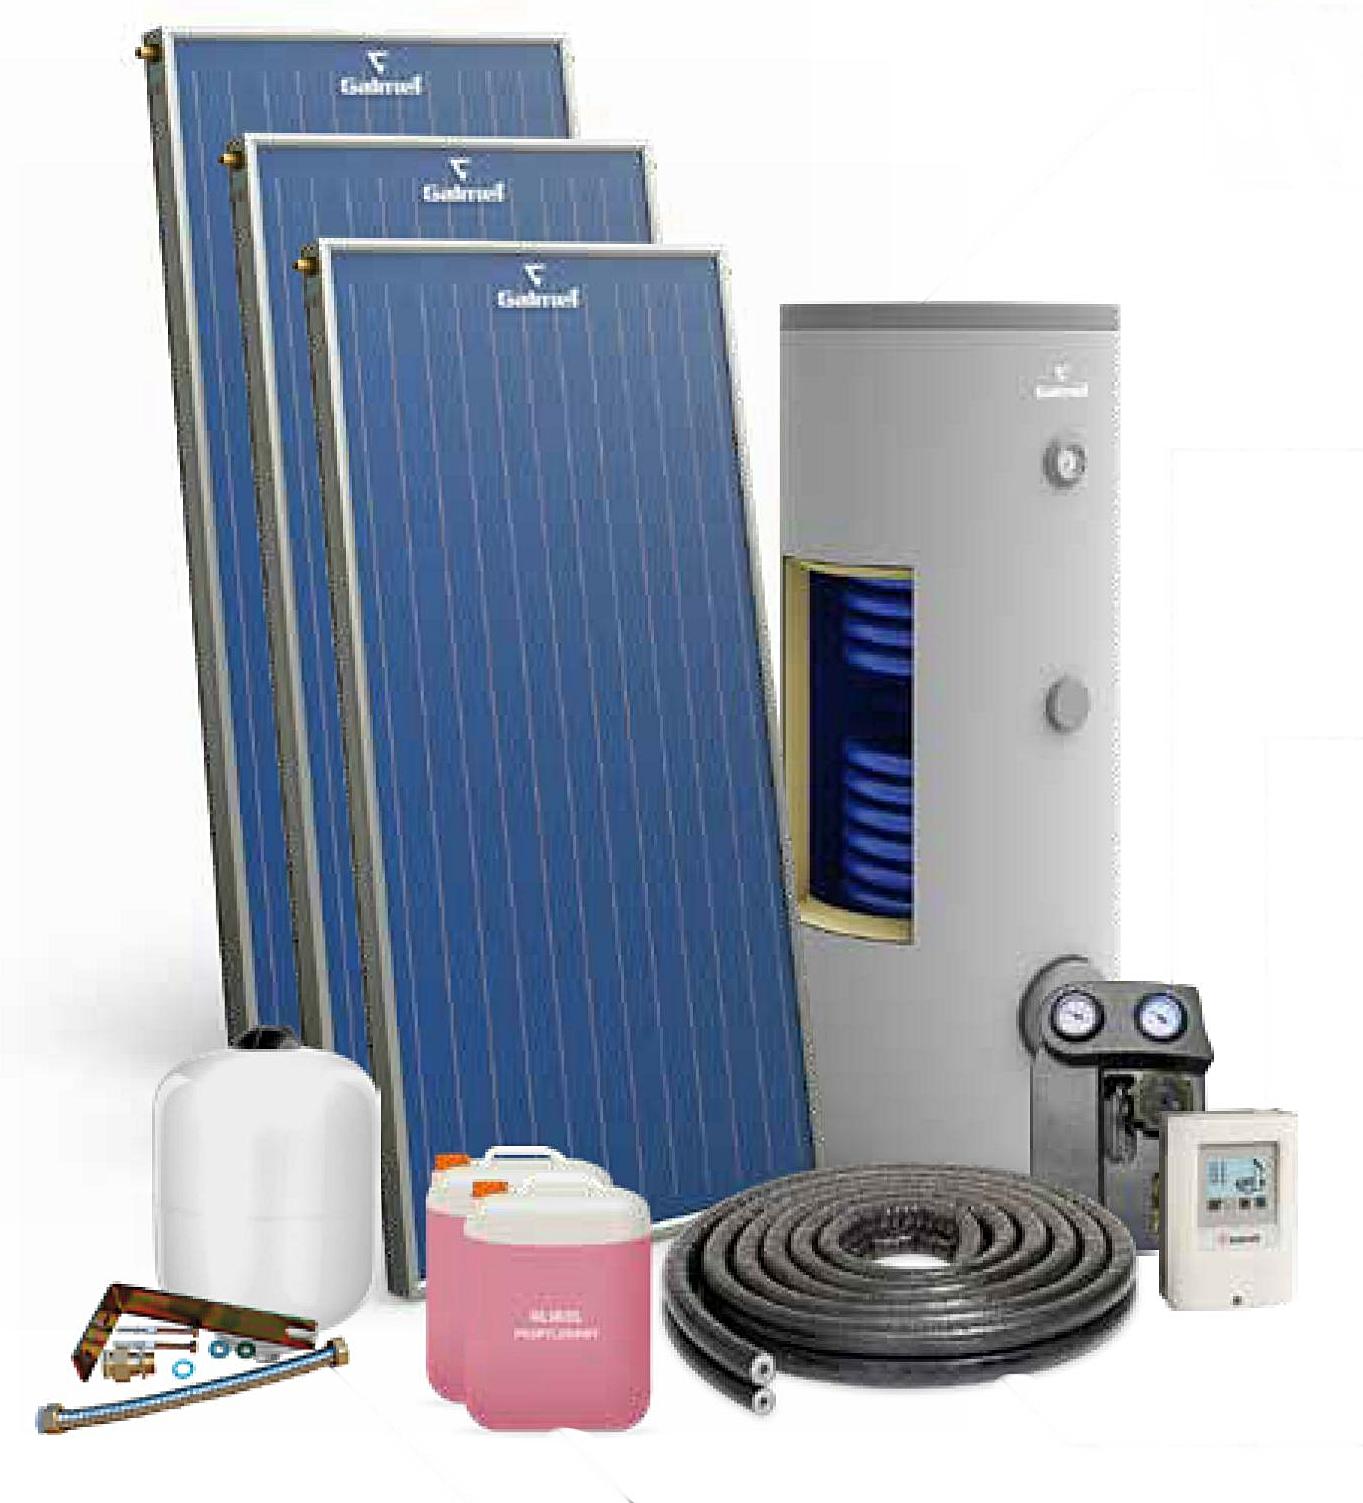 Zestaw solarny GALMET premium plus 3 solary + 300l